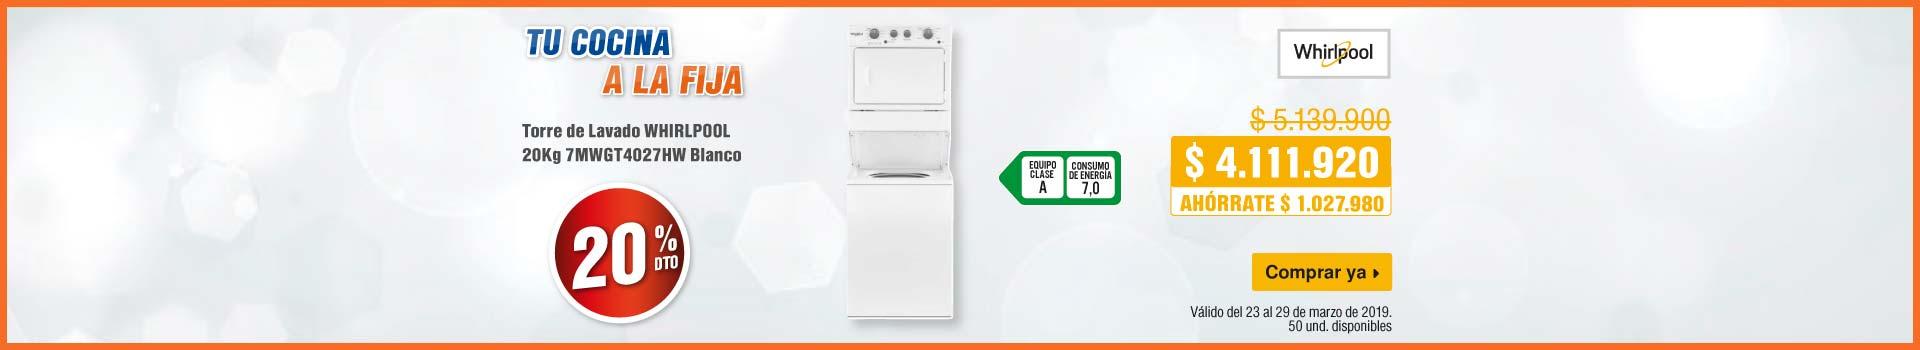 AK-KT-mayores-1-ELECT-BCAT-lavadoras-WHIRLPOOL-230319